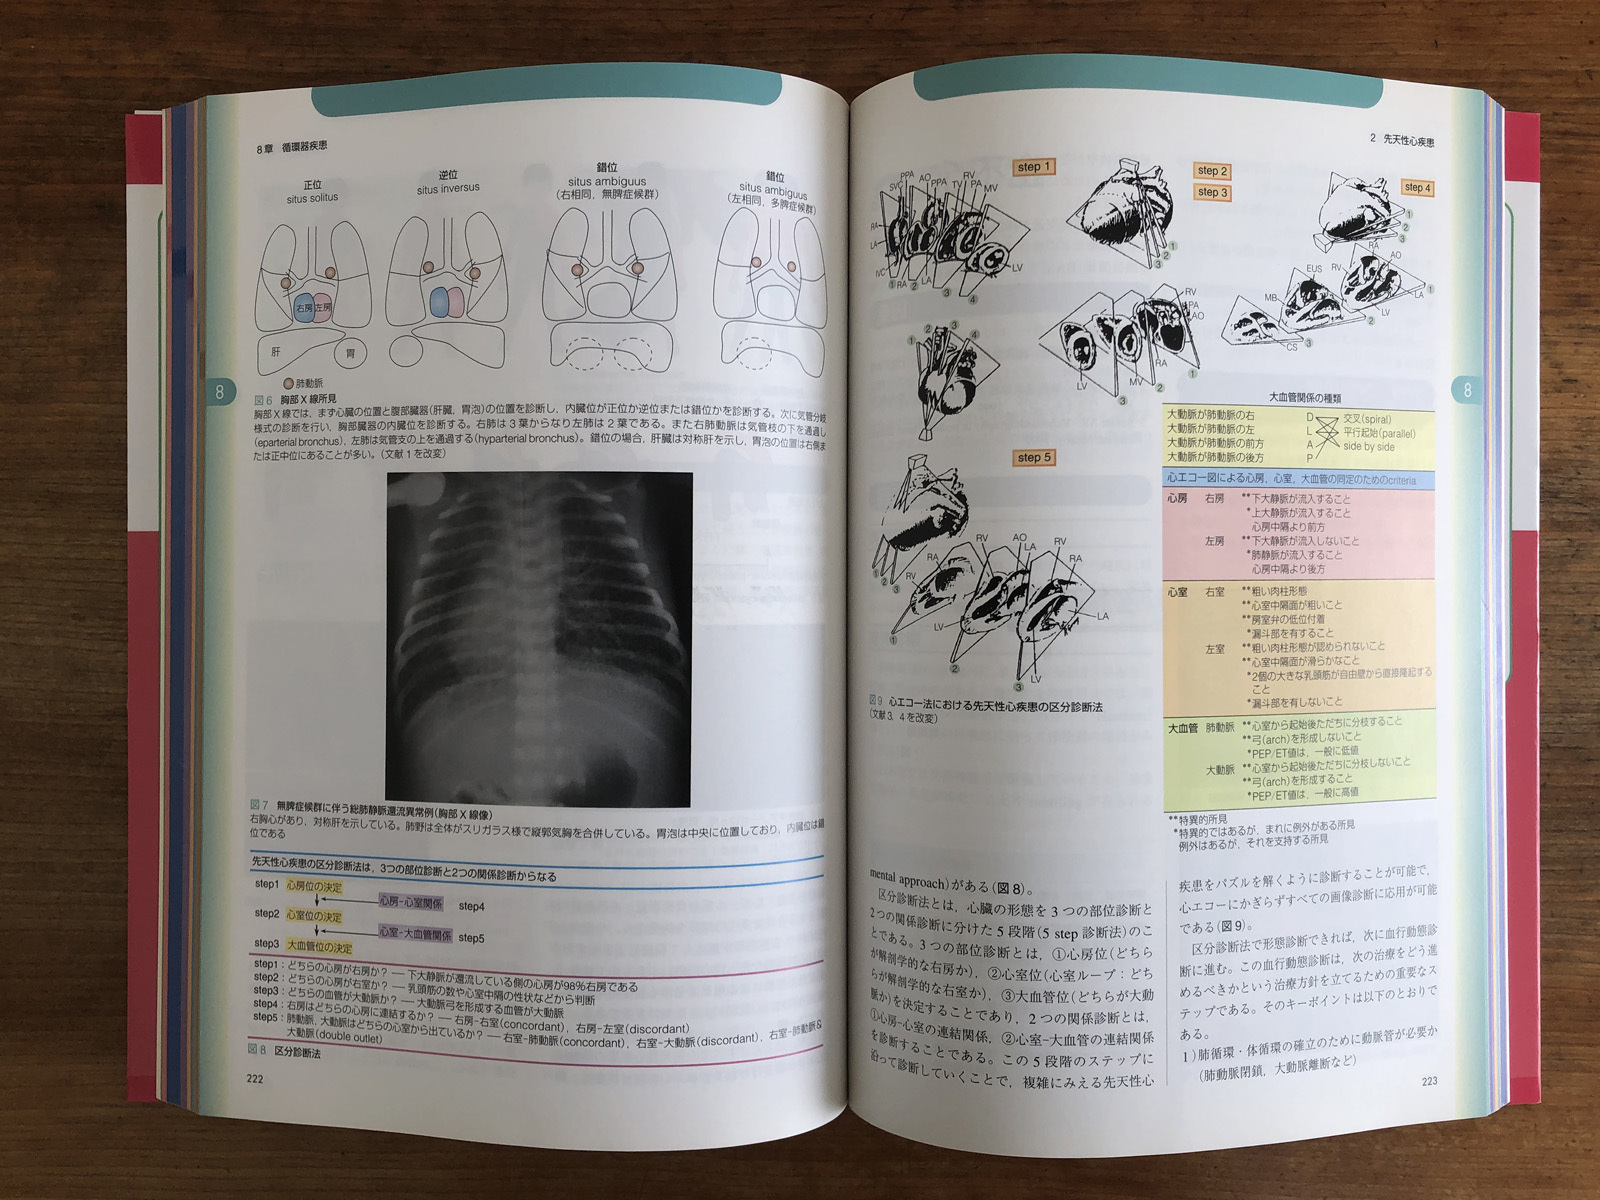 字典と専門書_e0367501_15151252.jpg